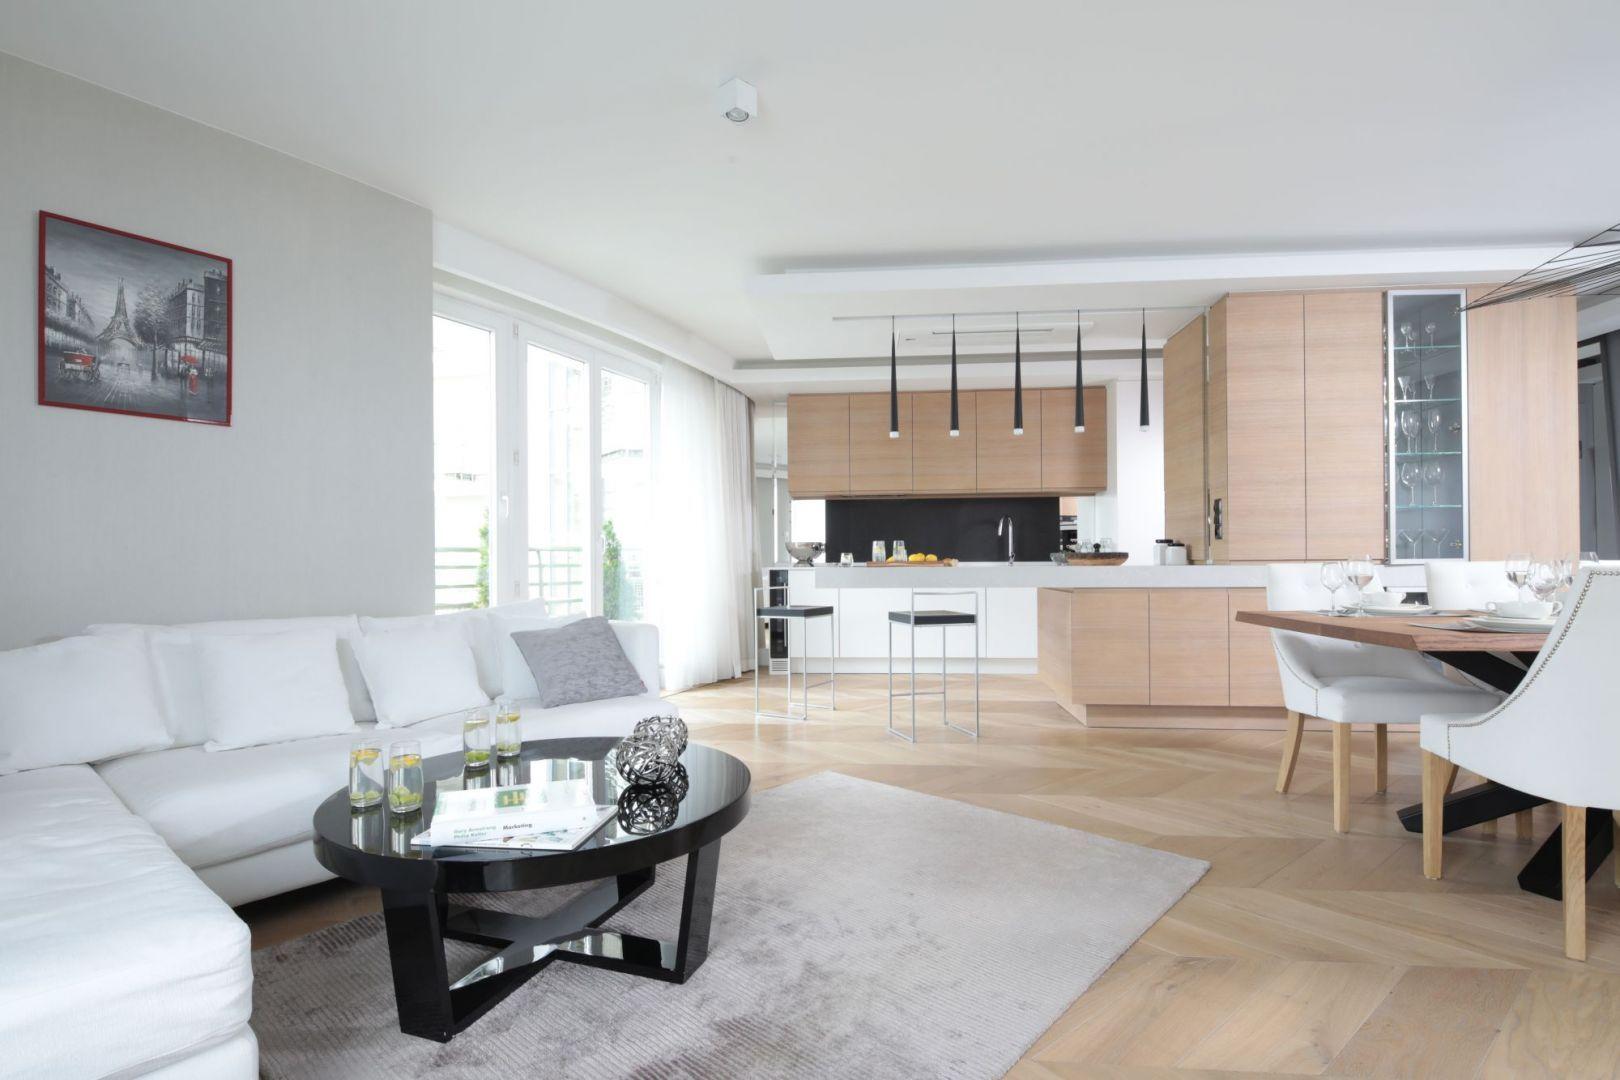 Pin on Salon z kuchnią i jadalnią/Open Plan Kitchen Living